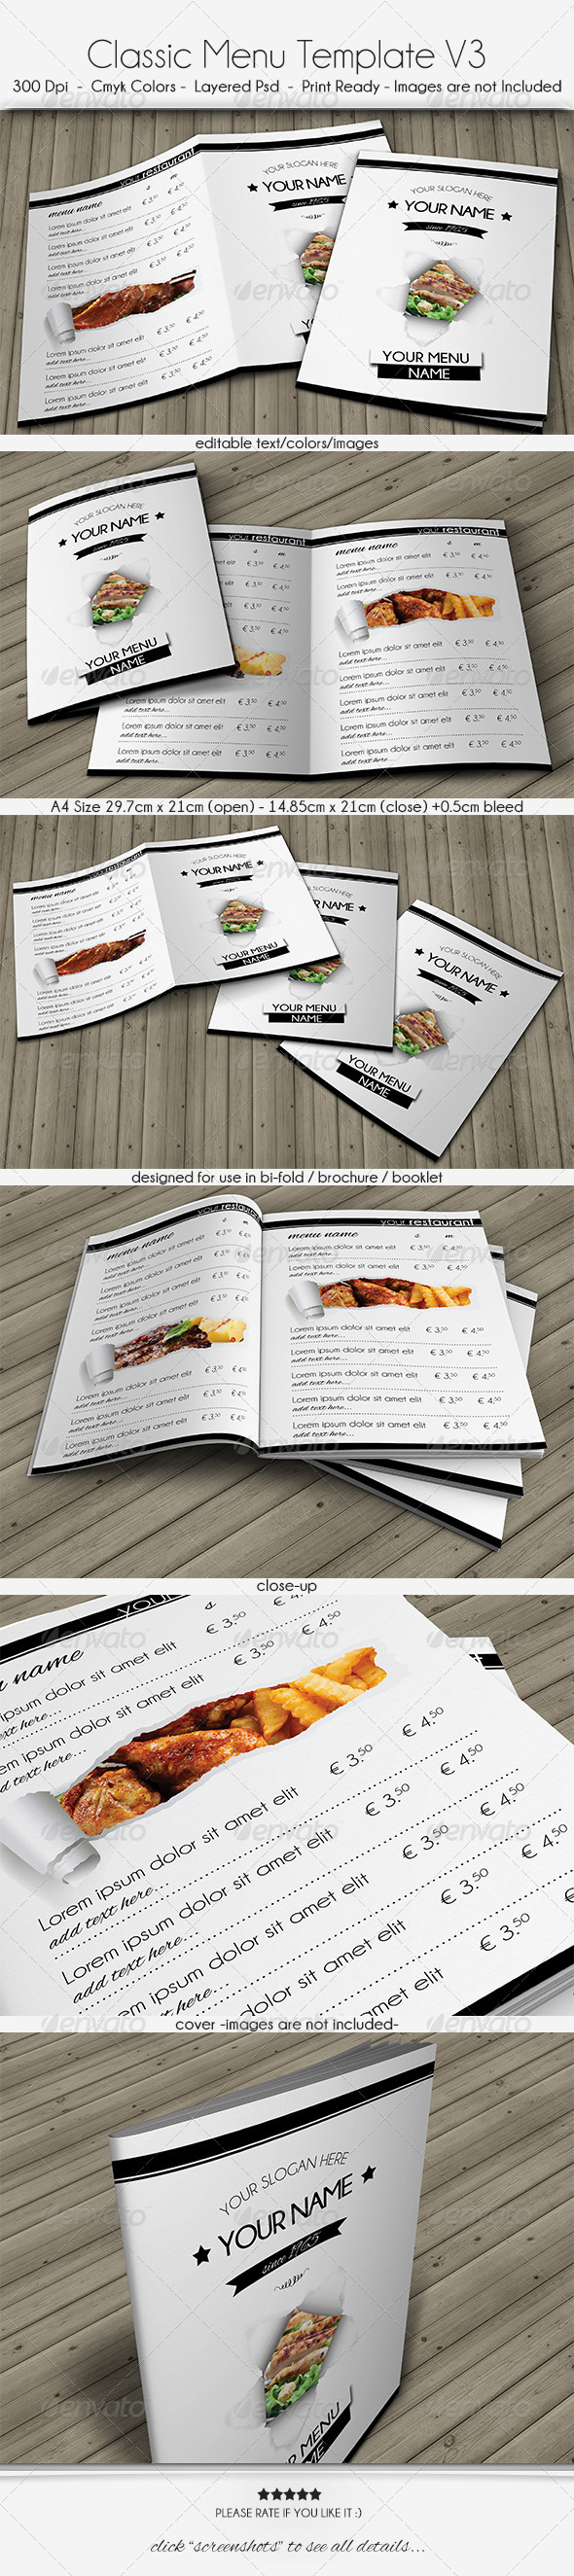 Classic Menu Template V3 - Food Menus Print Templates